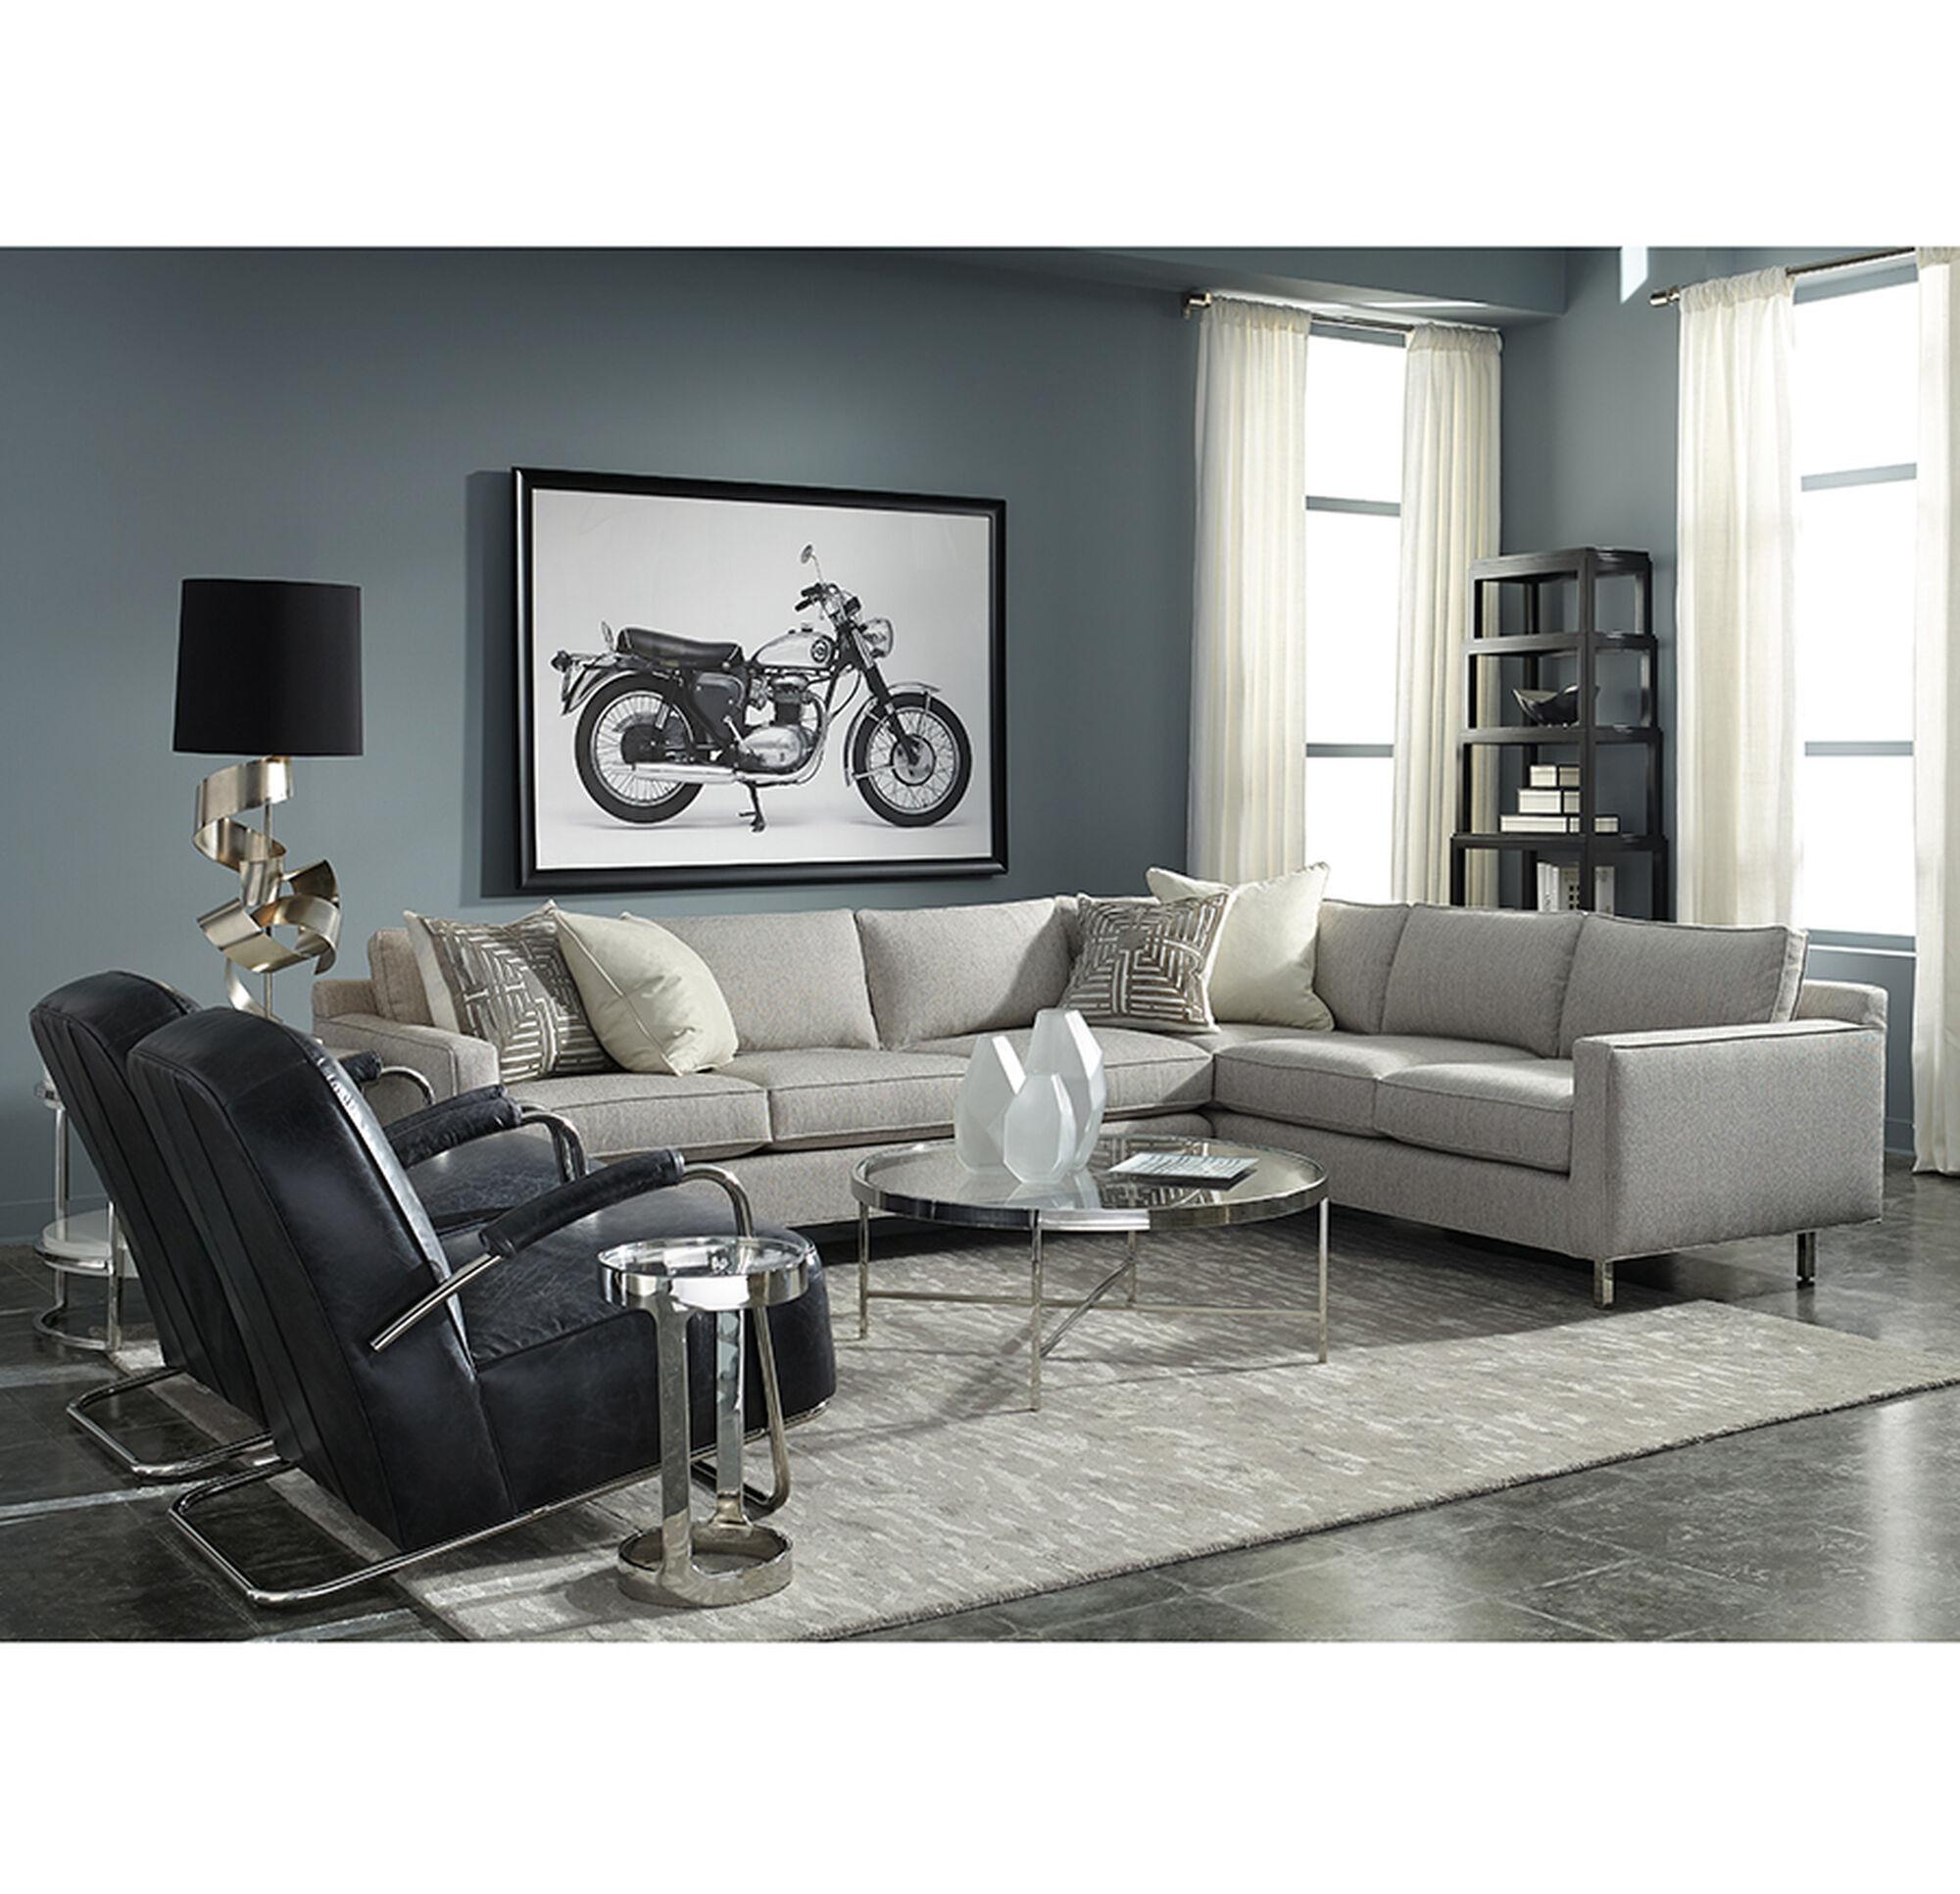 Motorcycle Wall Art bsa motorcycle wall art